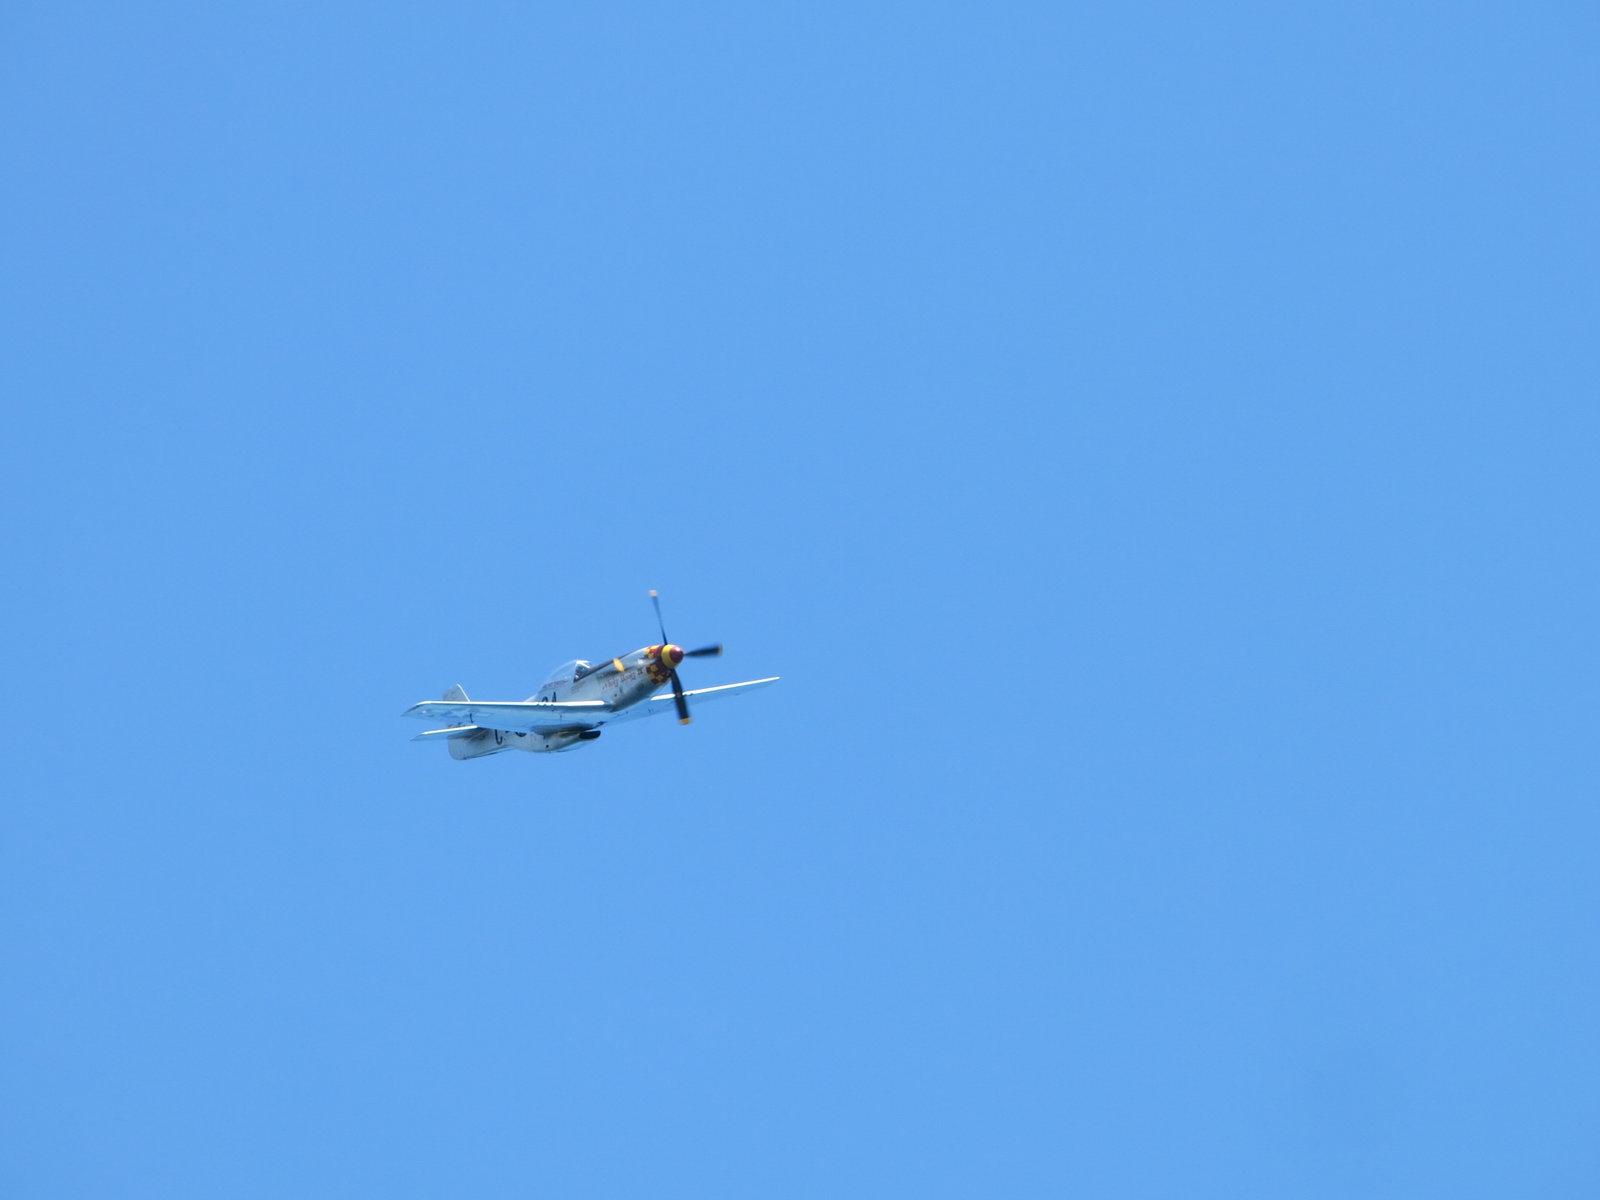 P-51Mustang